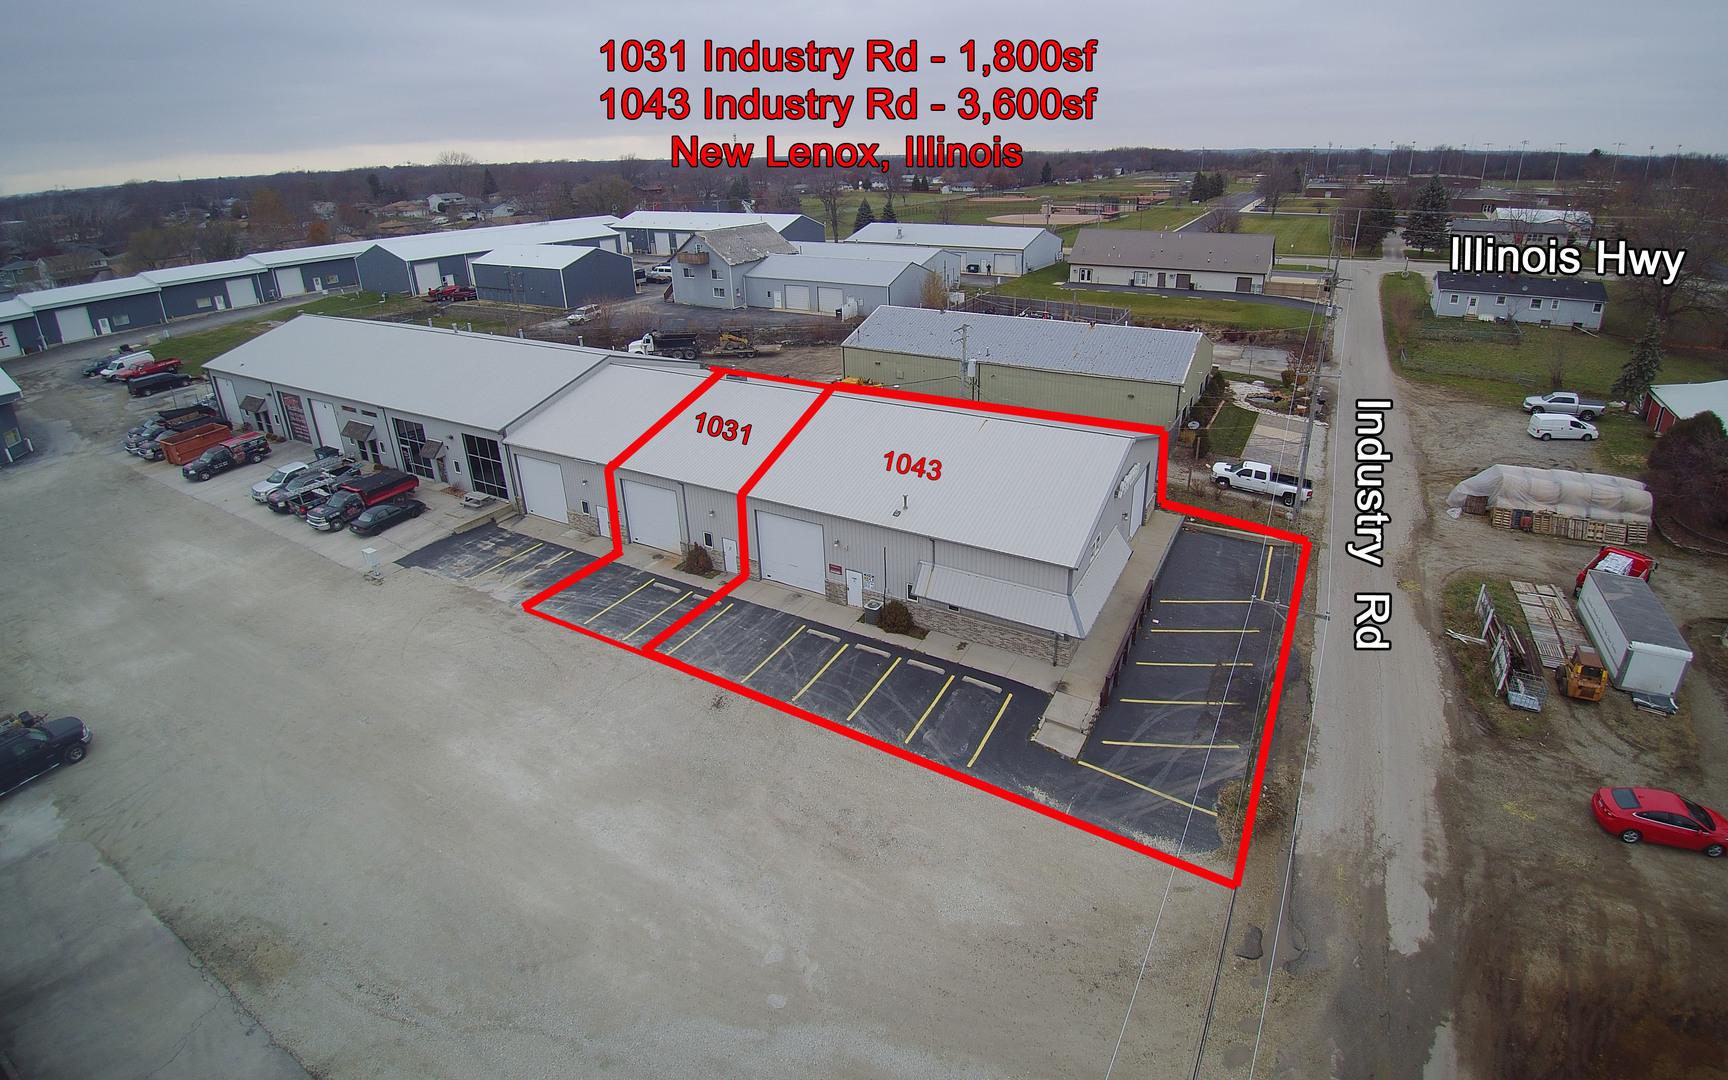 1043 Industry, New Lenox, Illinois 60451